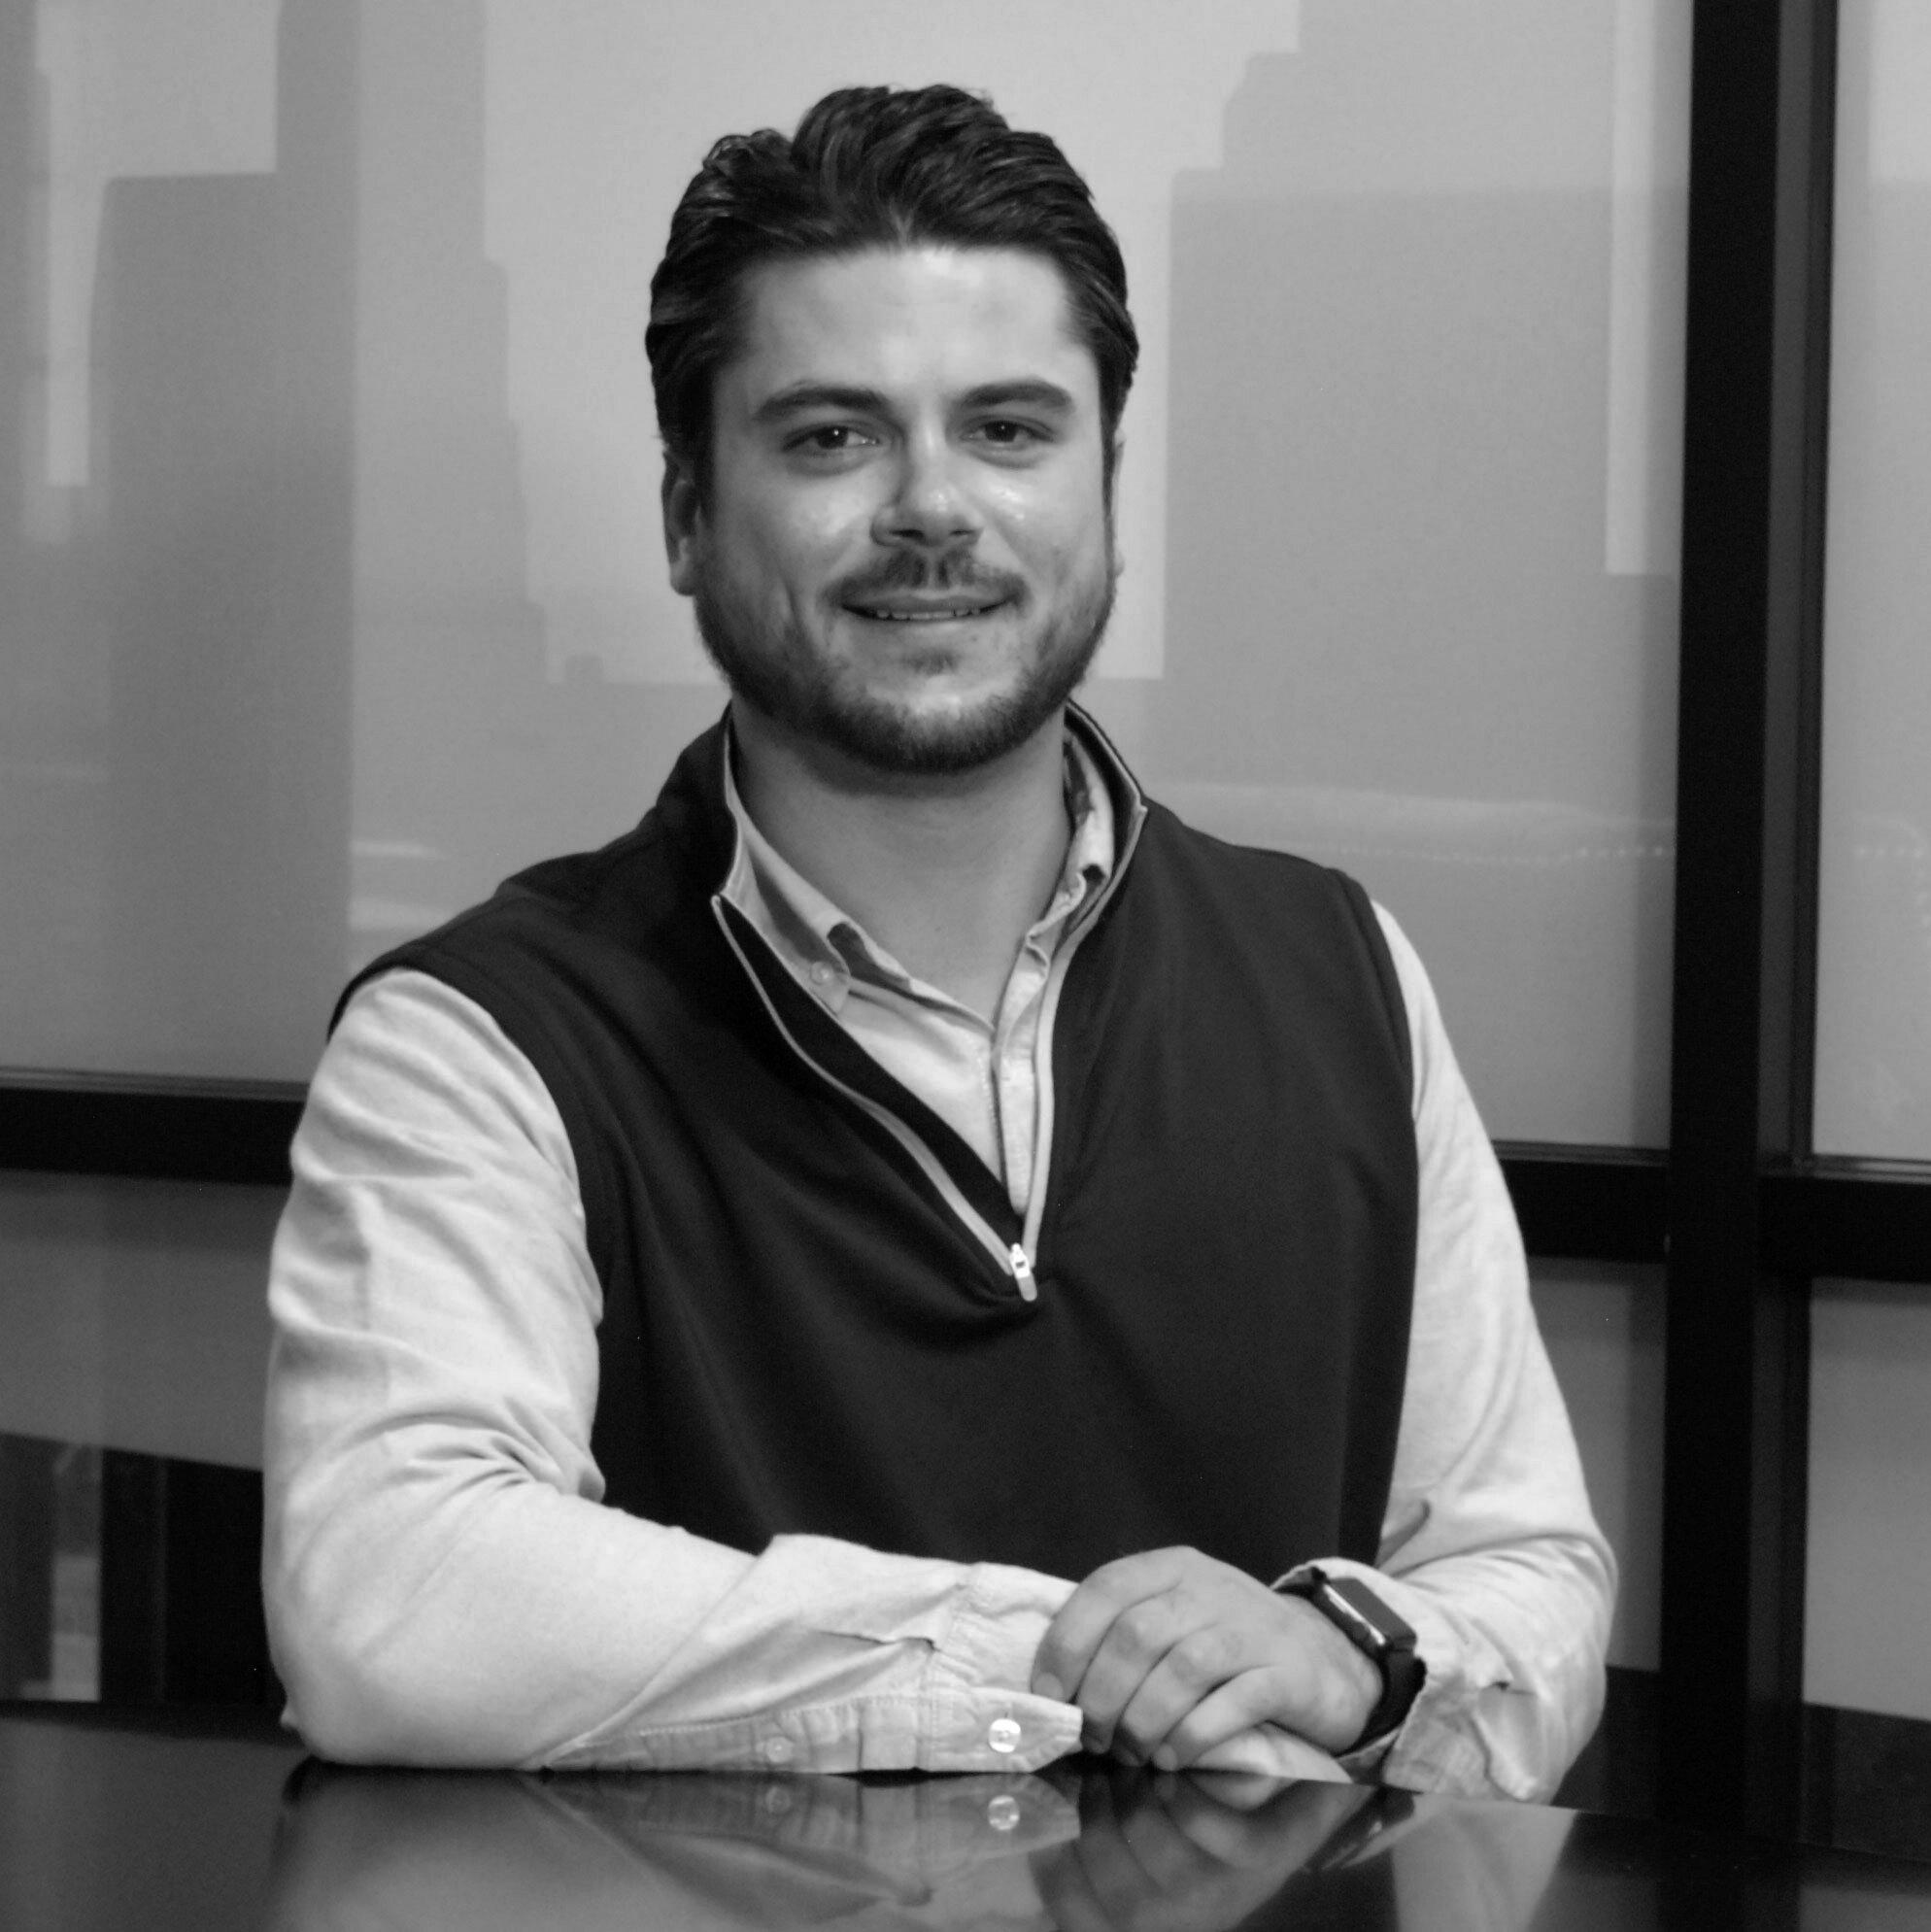 Evean Diener - Executive Vice President